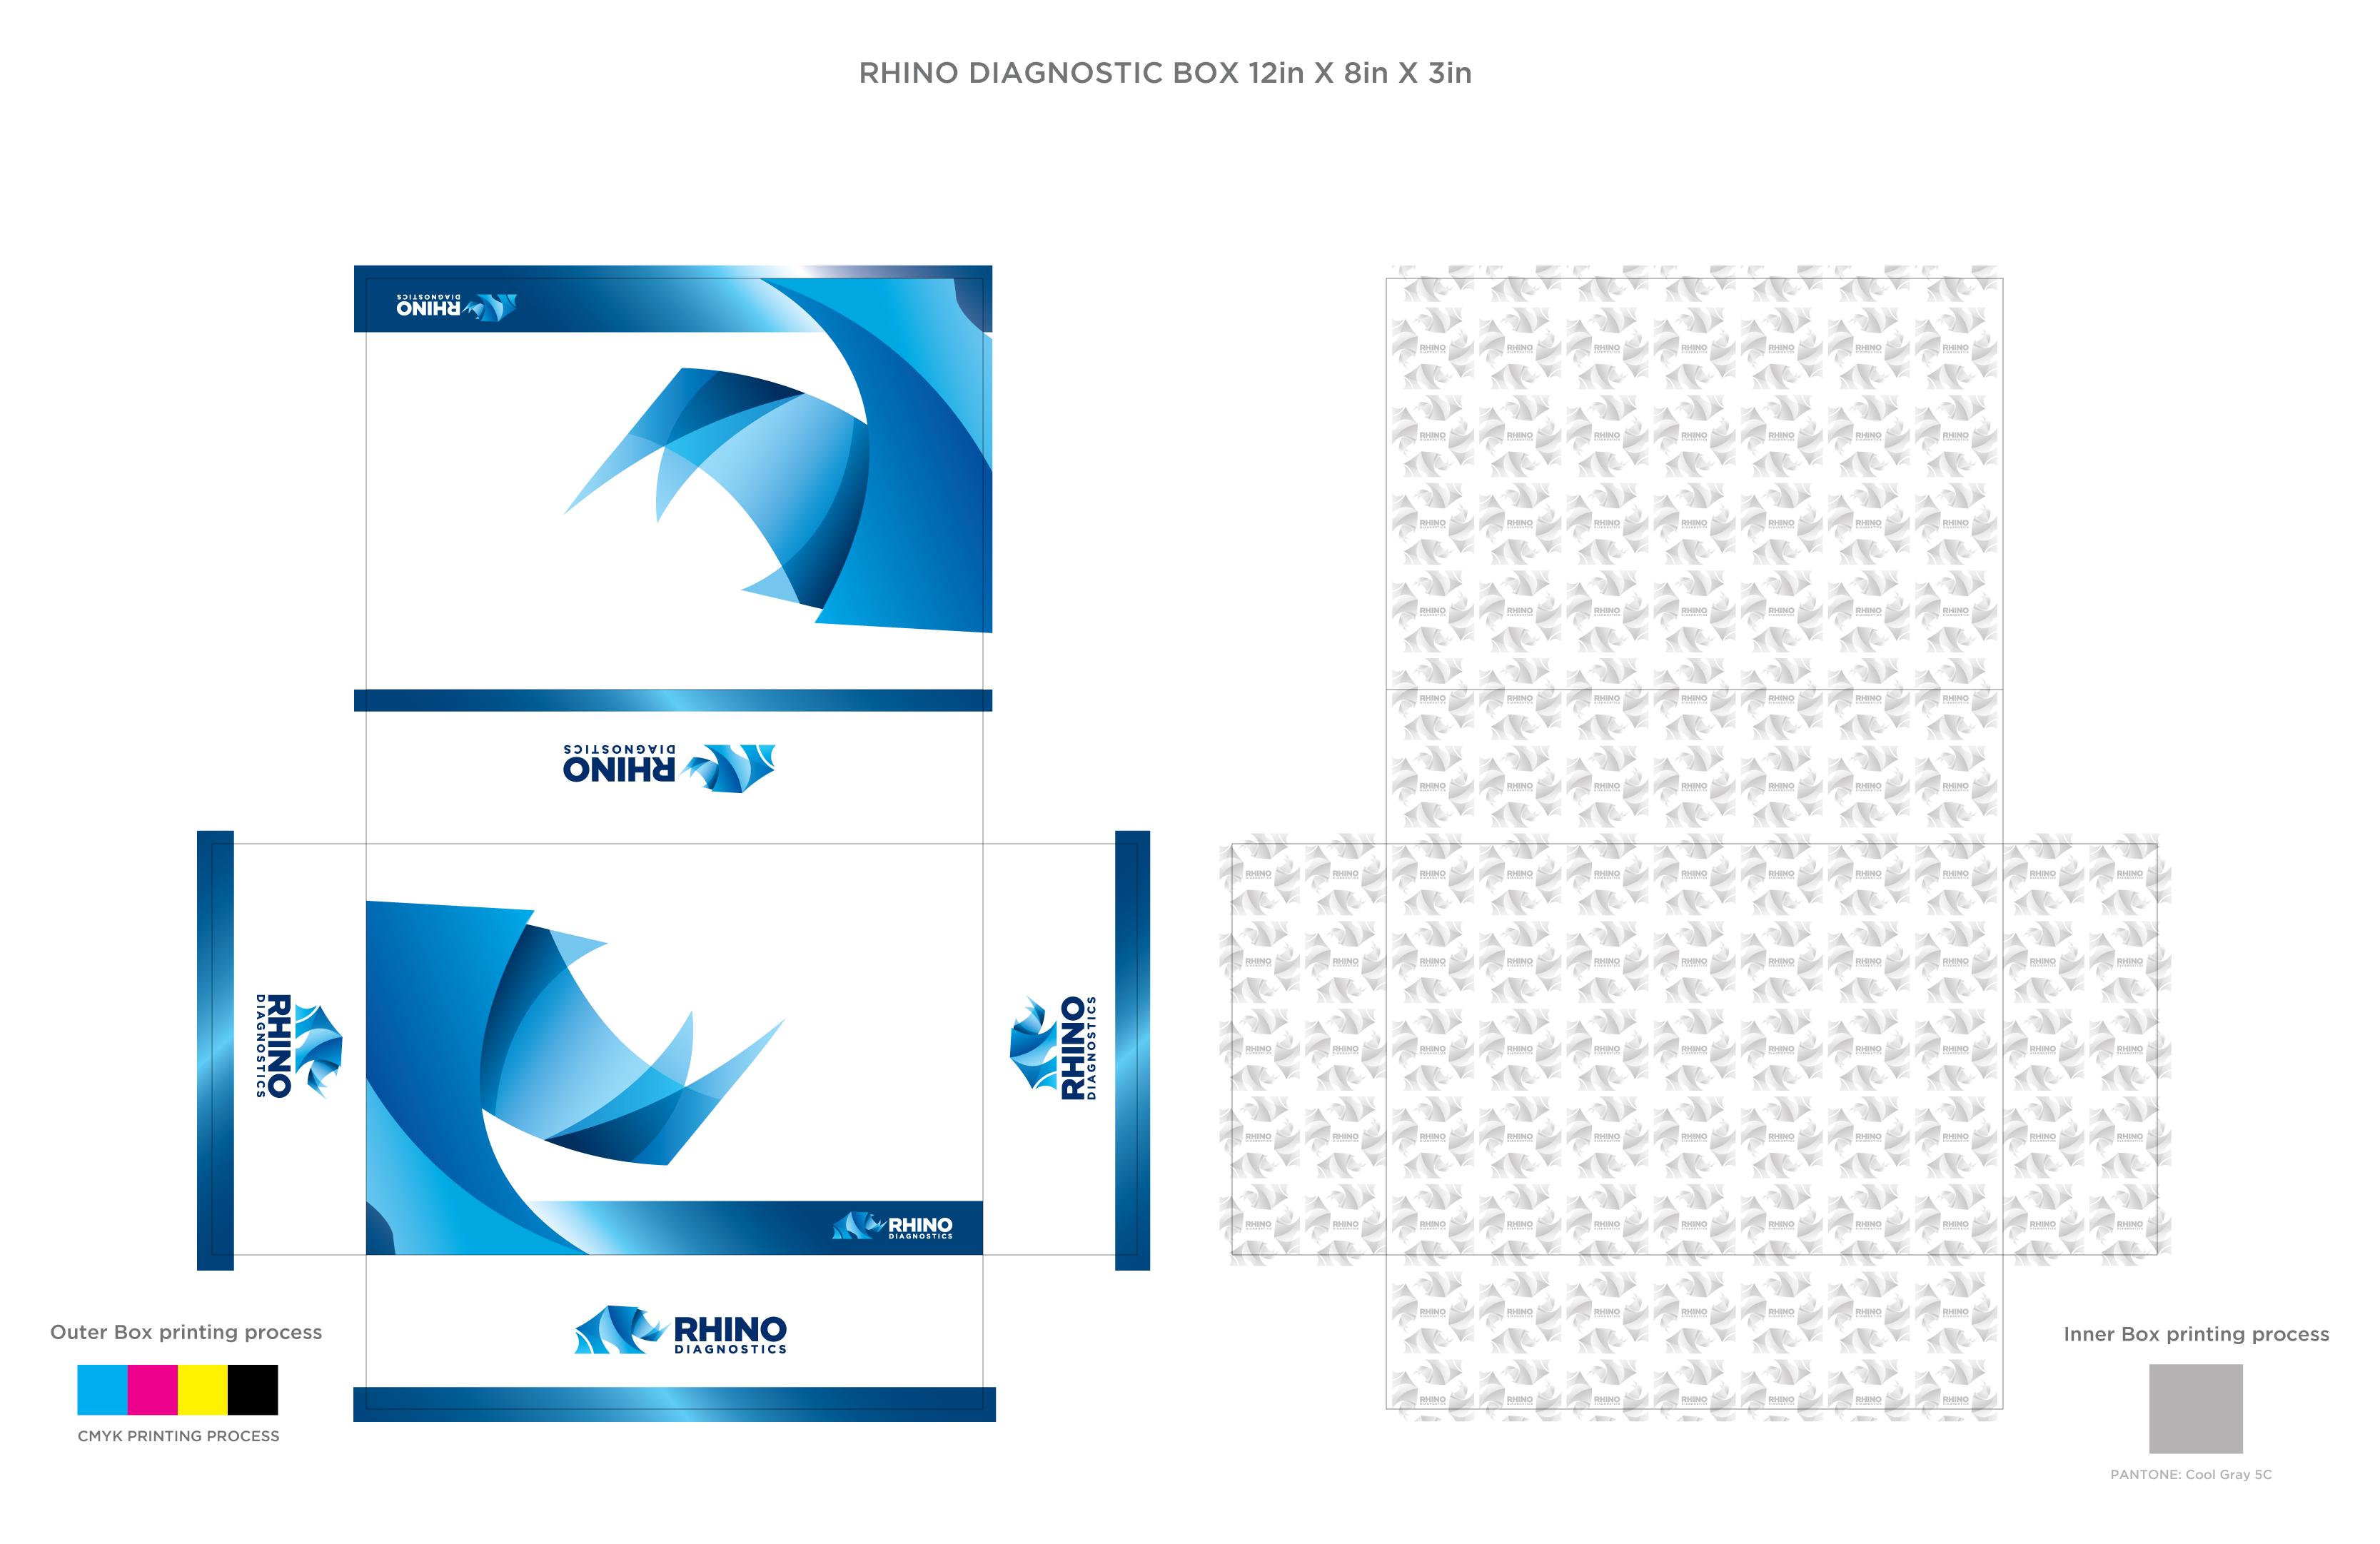 Packaging/box design